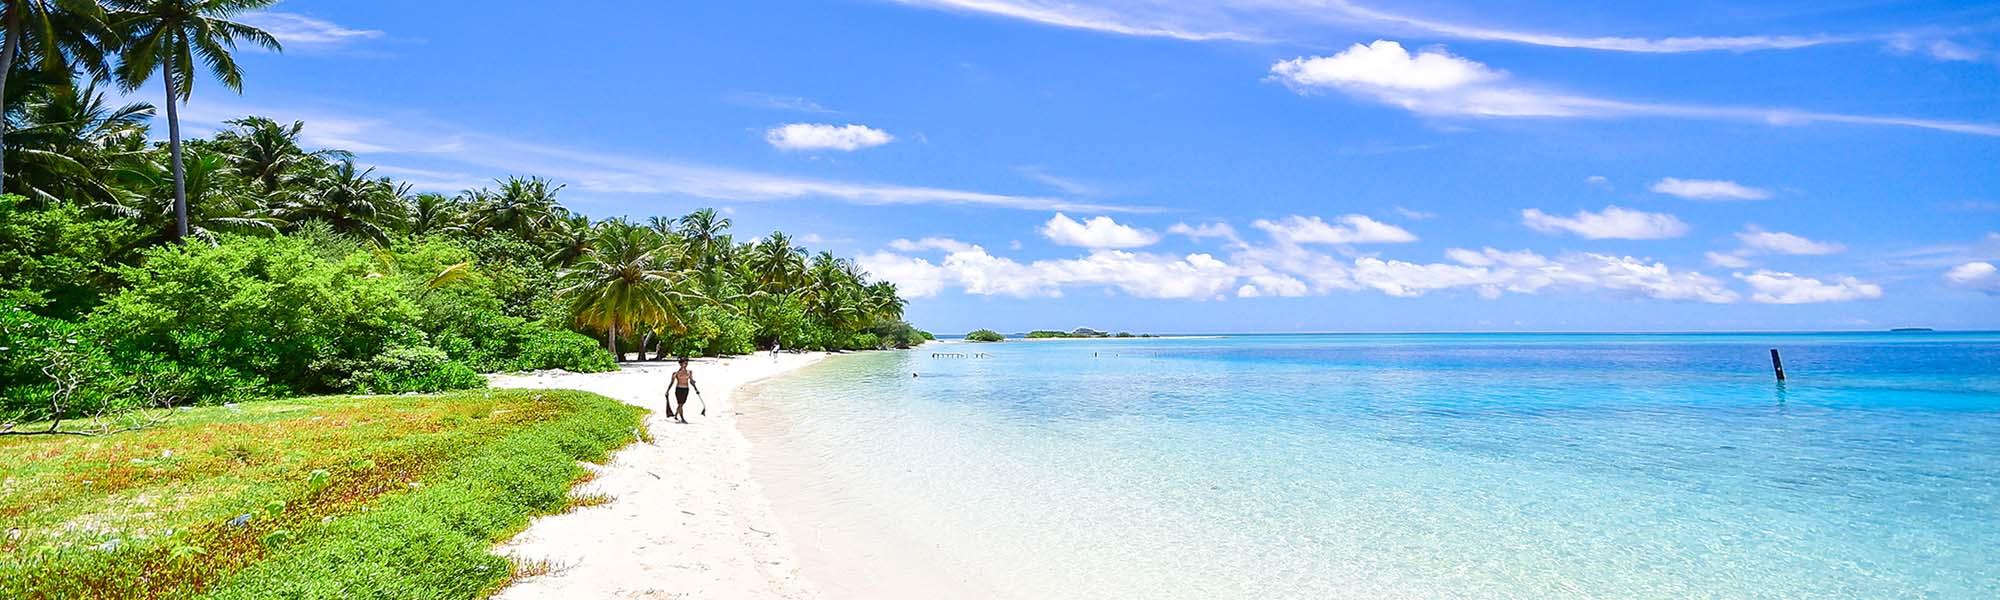 Celebrity Cruise To Bermuda - Bayonne, New Jersey - Cruise ...